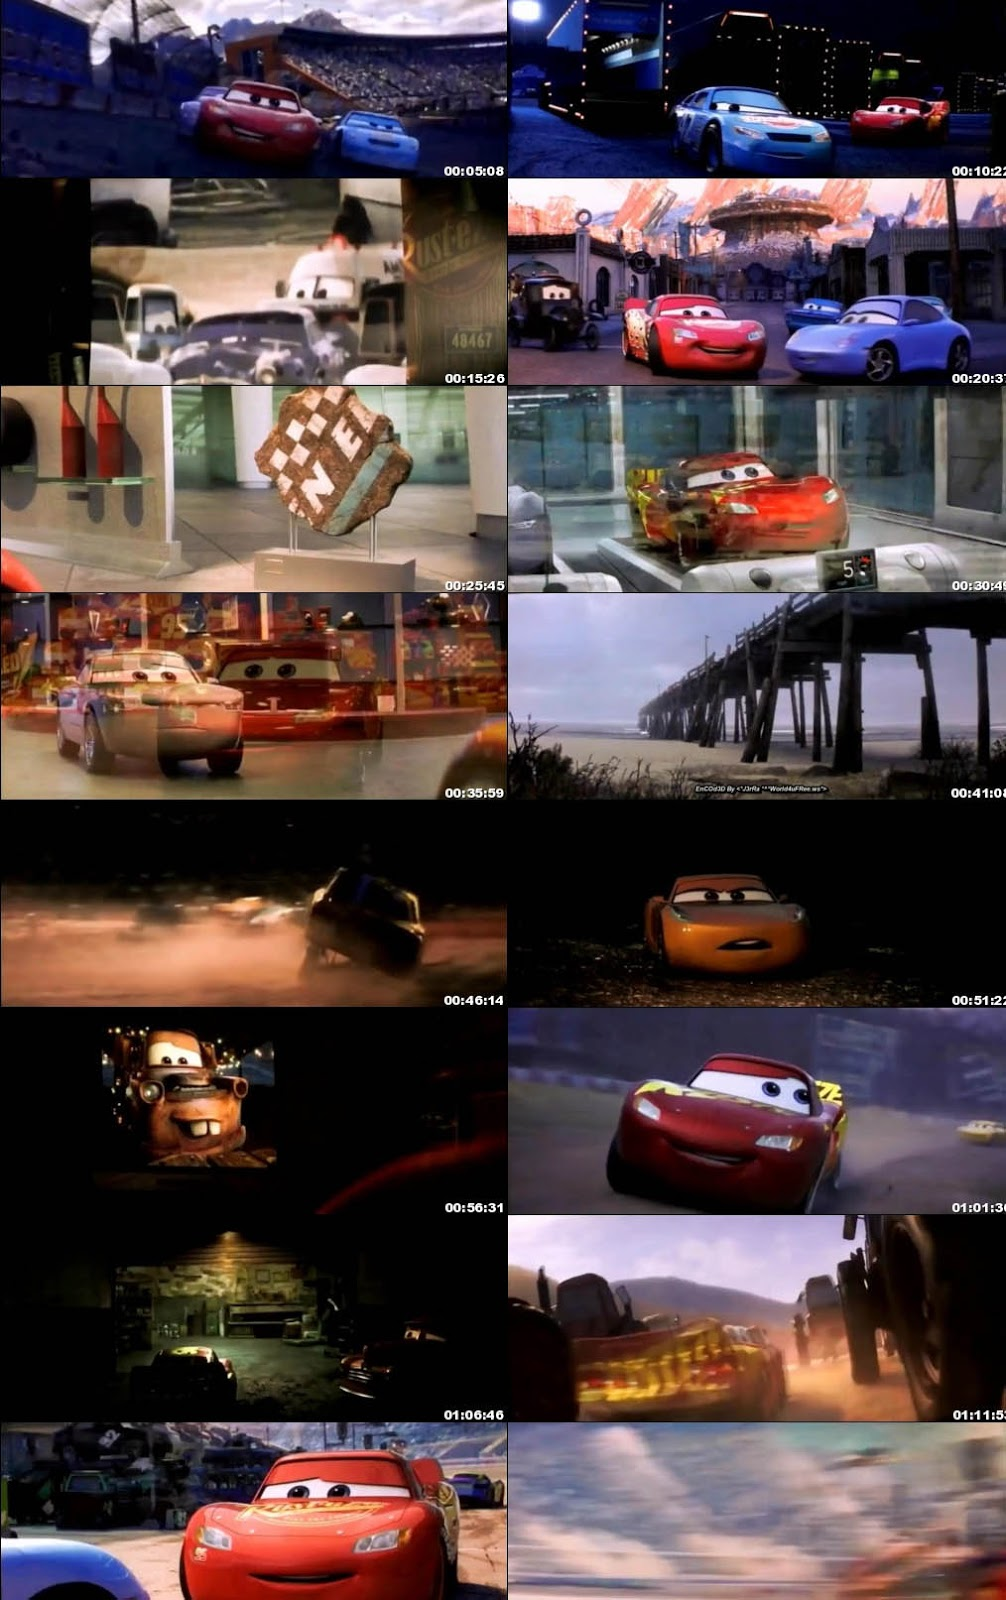 Cars 3 2017 English Movie Download HD at movies500.com